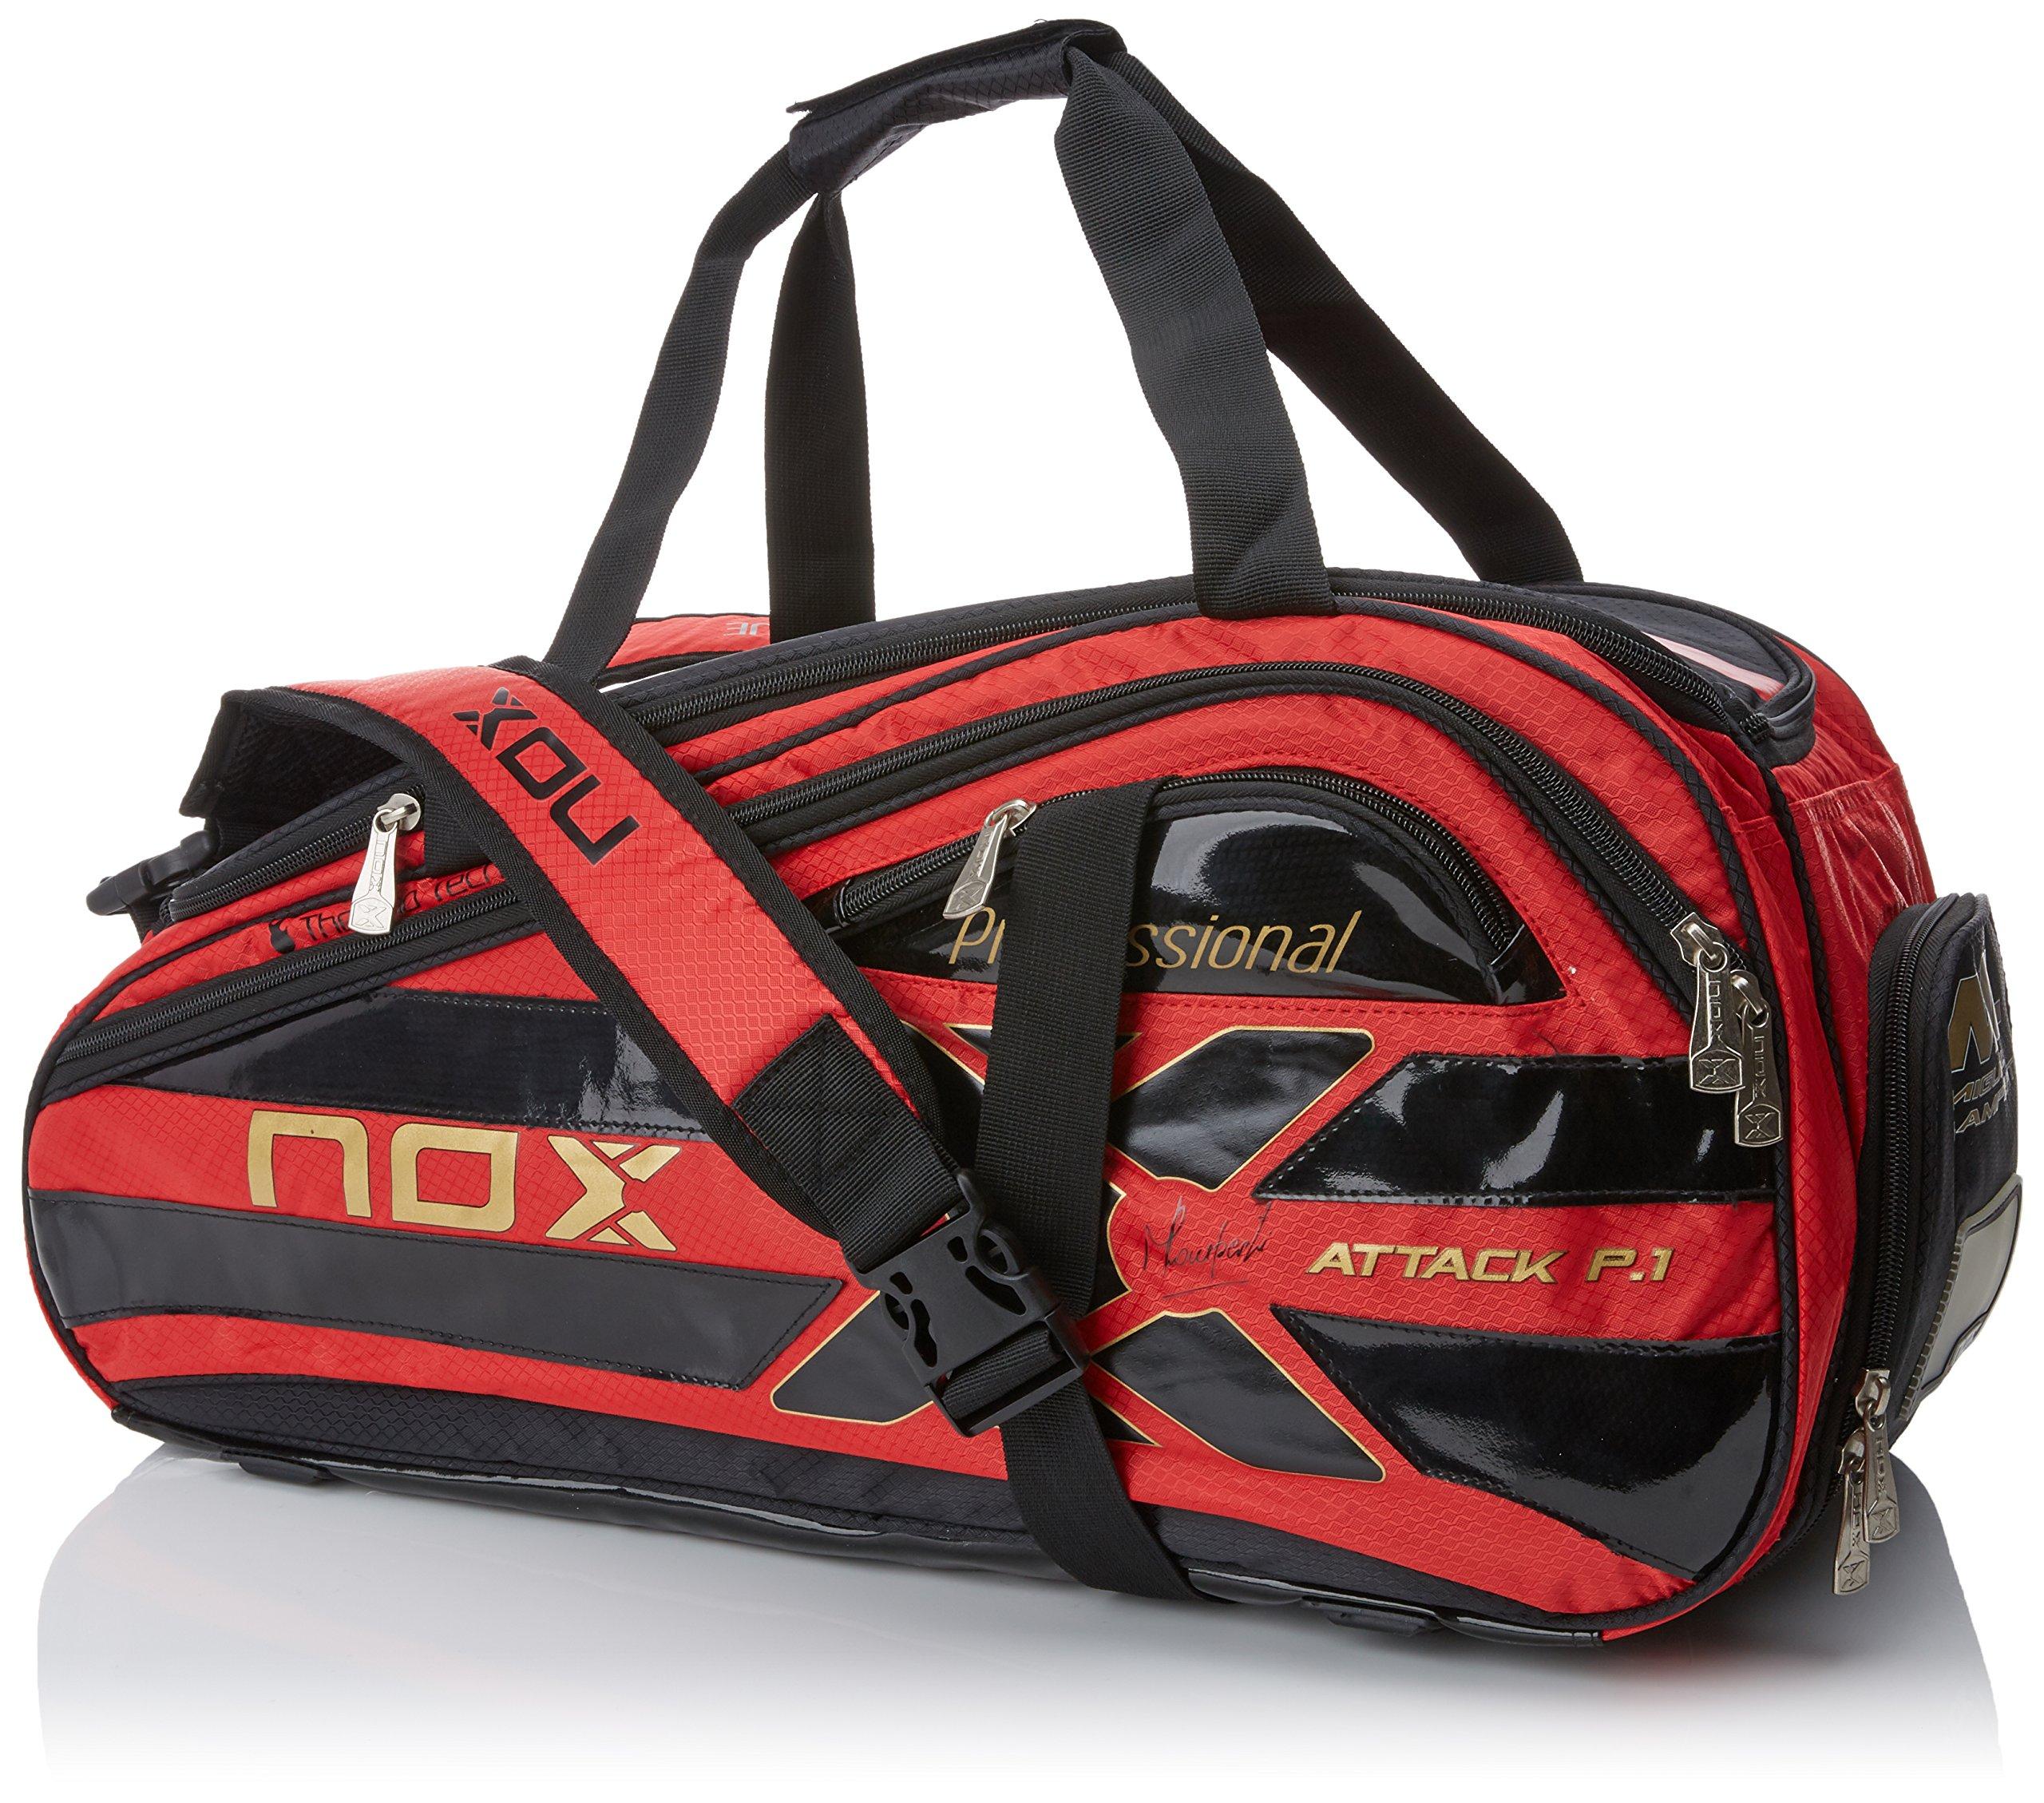 NOX Thermo Attack P.1 Paletero, Unisex Adulto, Rojo product image